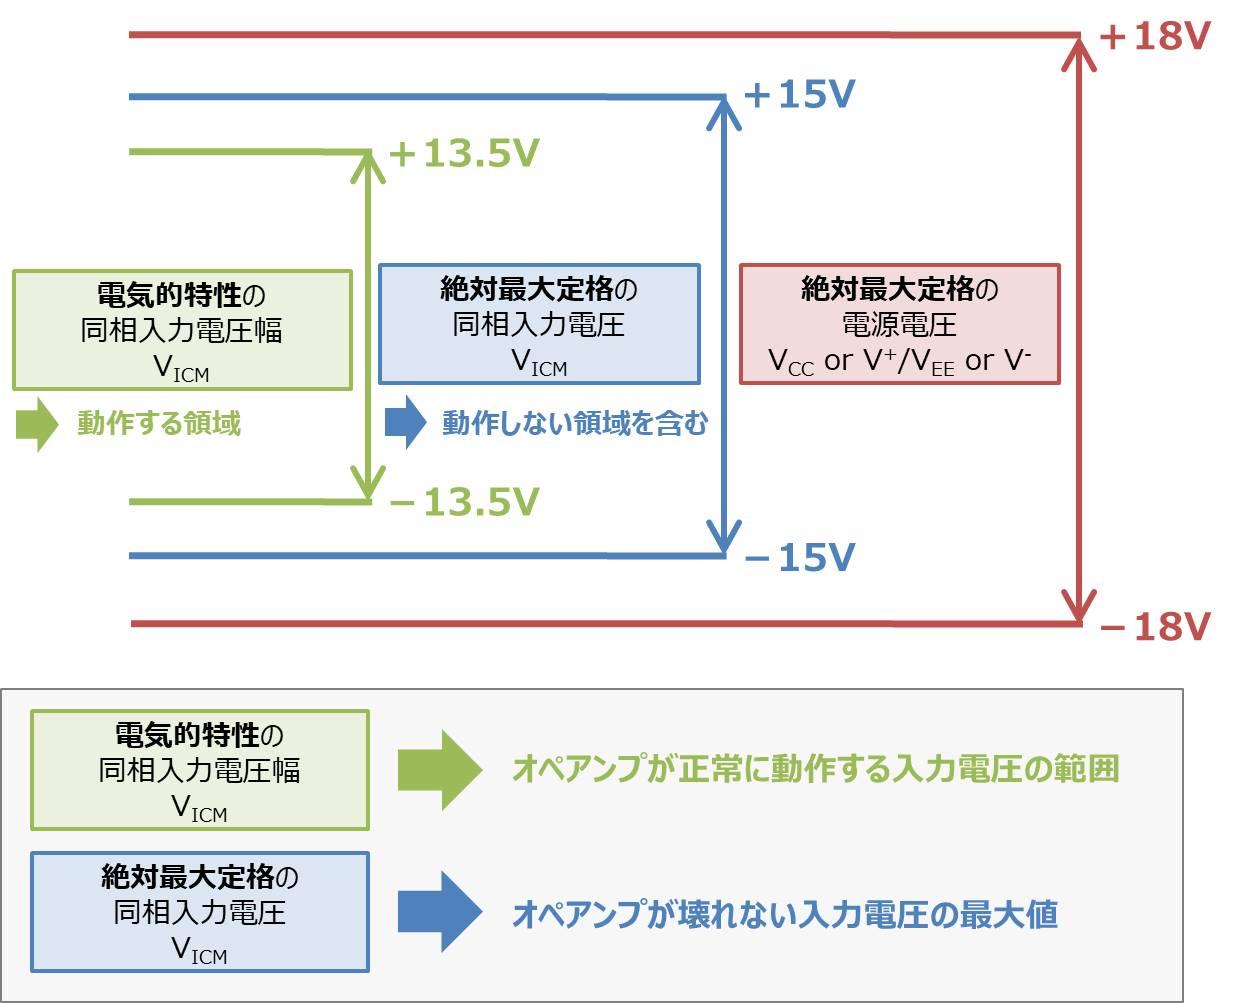 電気的特性の『同相入力電圧範囲』と絶対最大定格の『同相入力電圧』の範囲